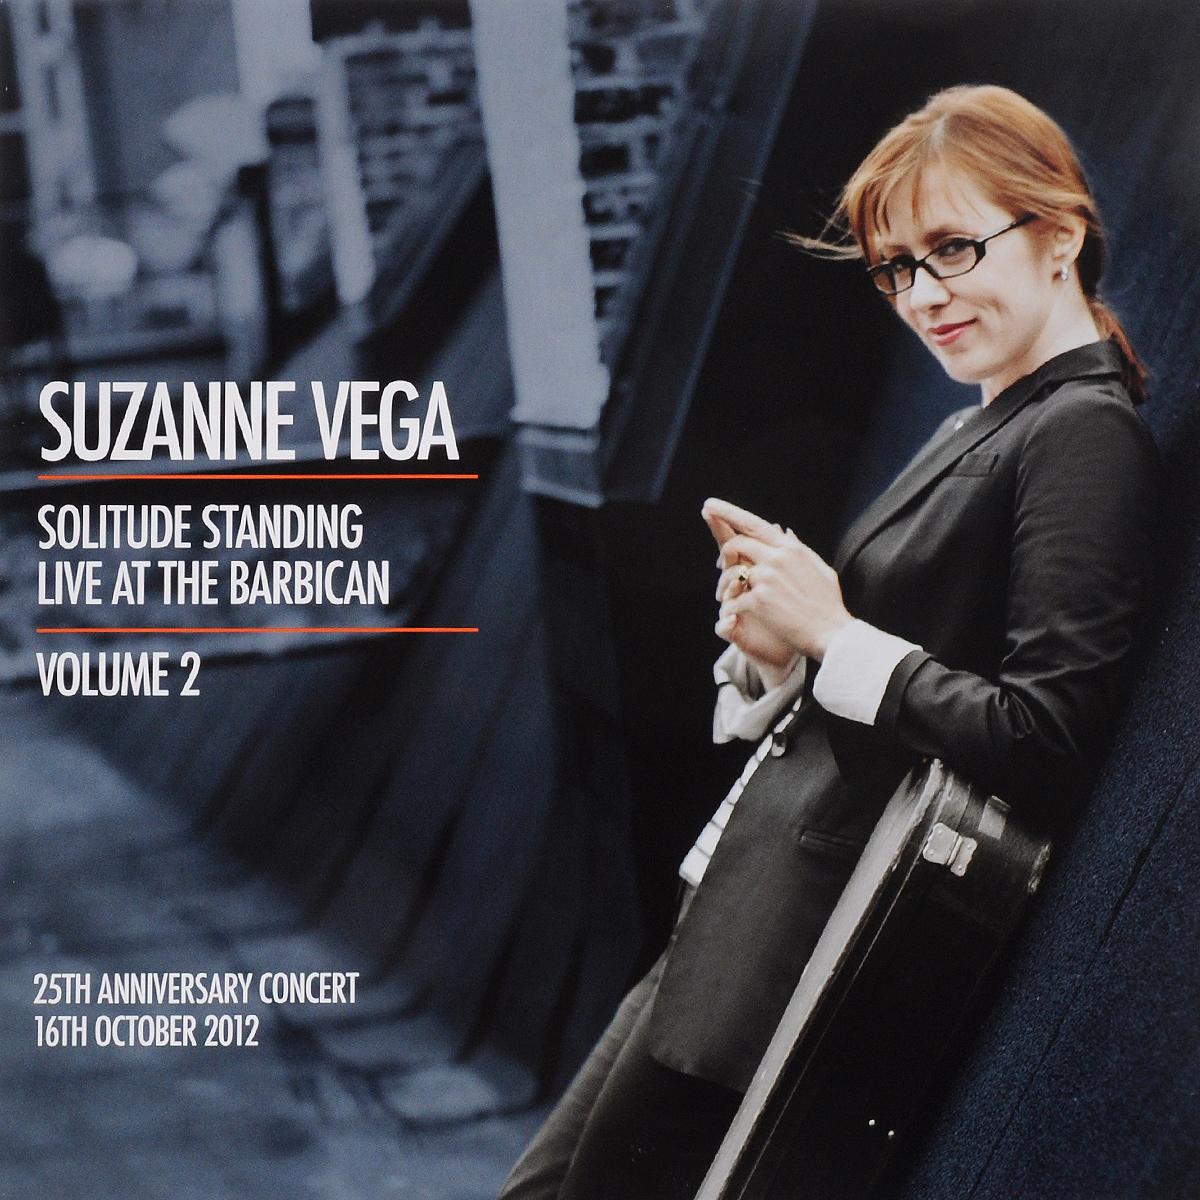 Сьюзанн Вега Suzanne Vega. Live At The Barbican Vol.2 (2LP) suzanne vega bexhill